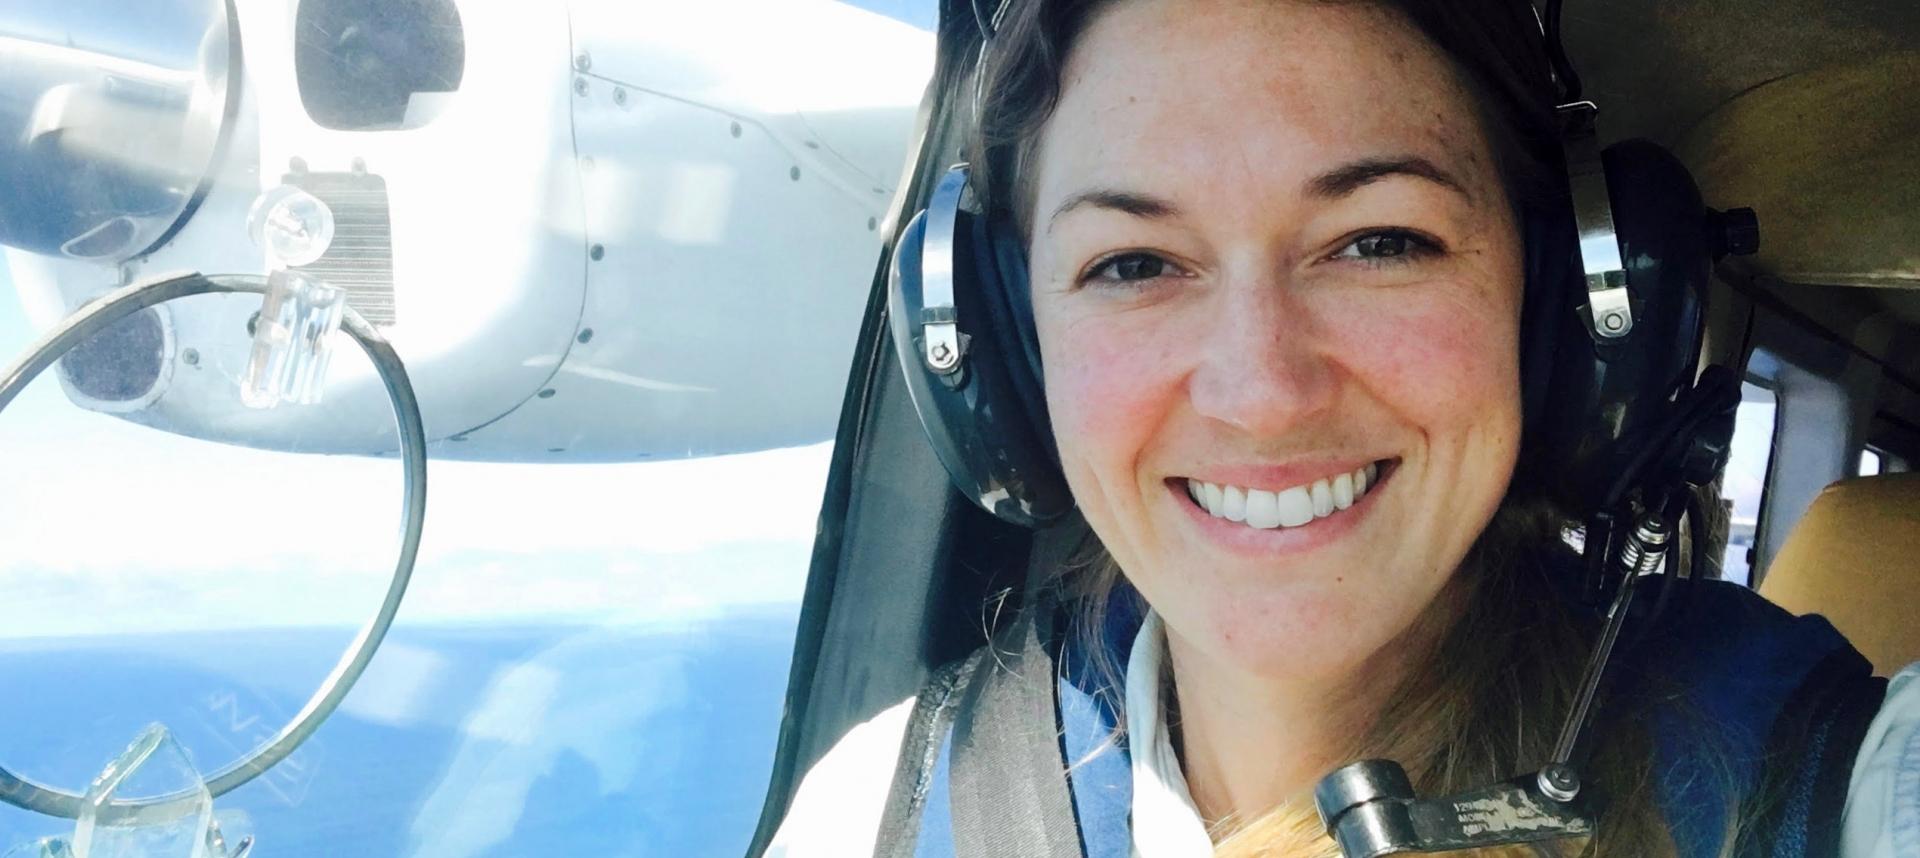 Smiling woman passenger on plane